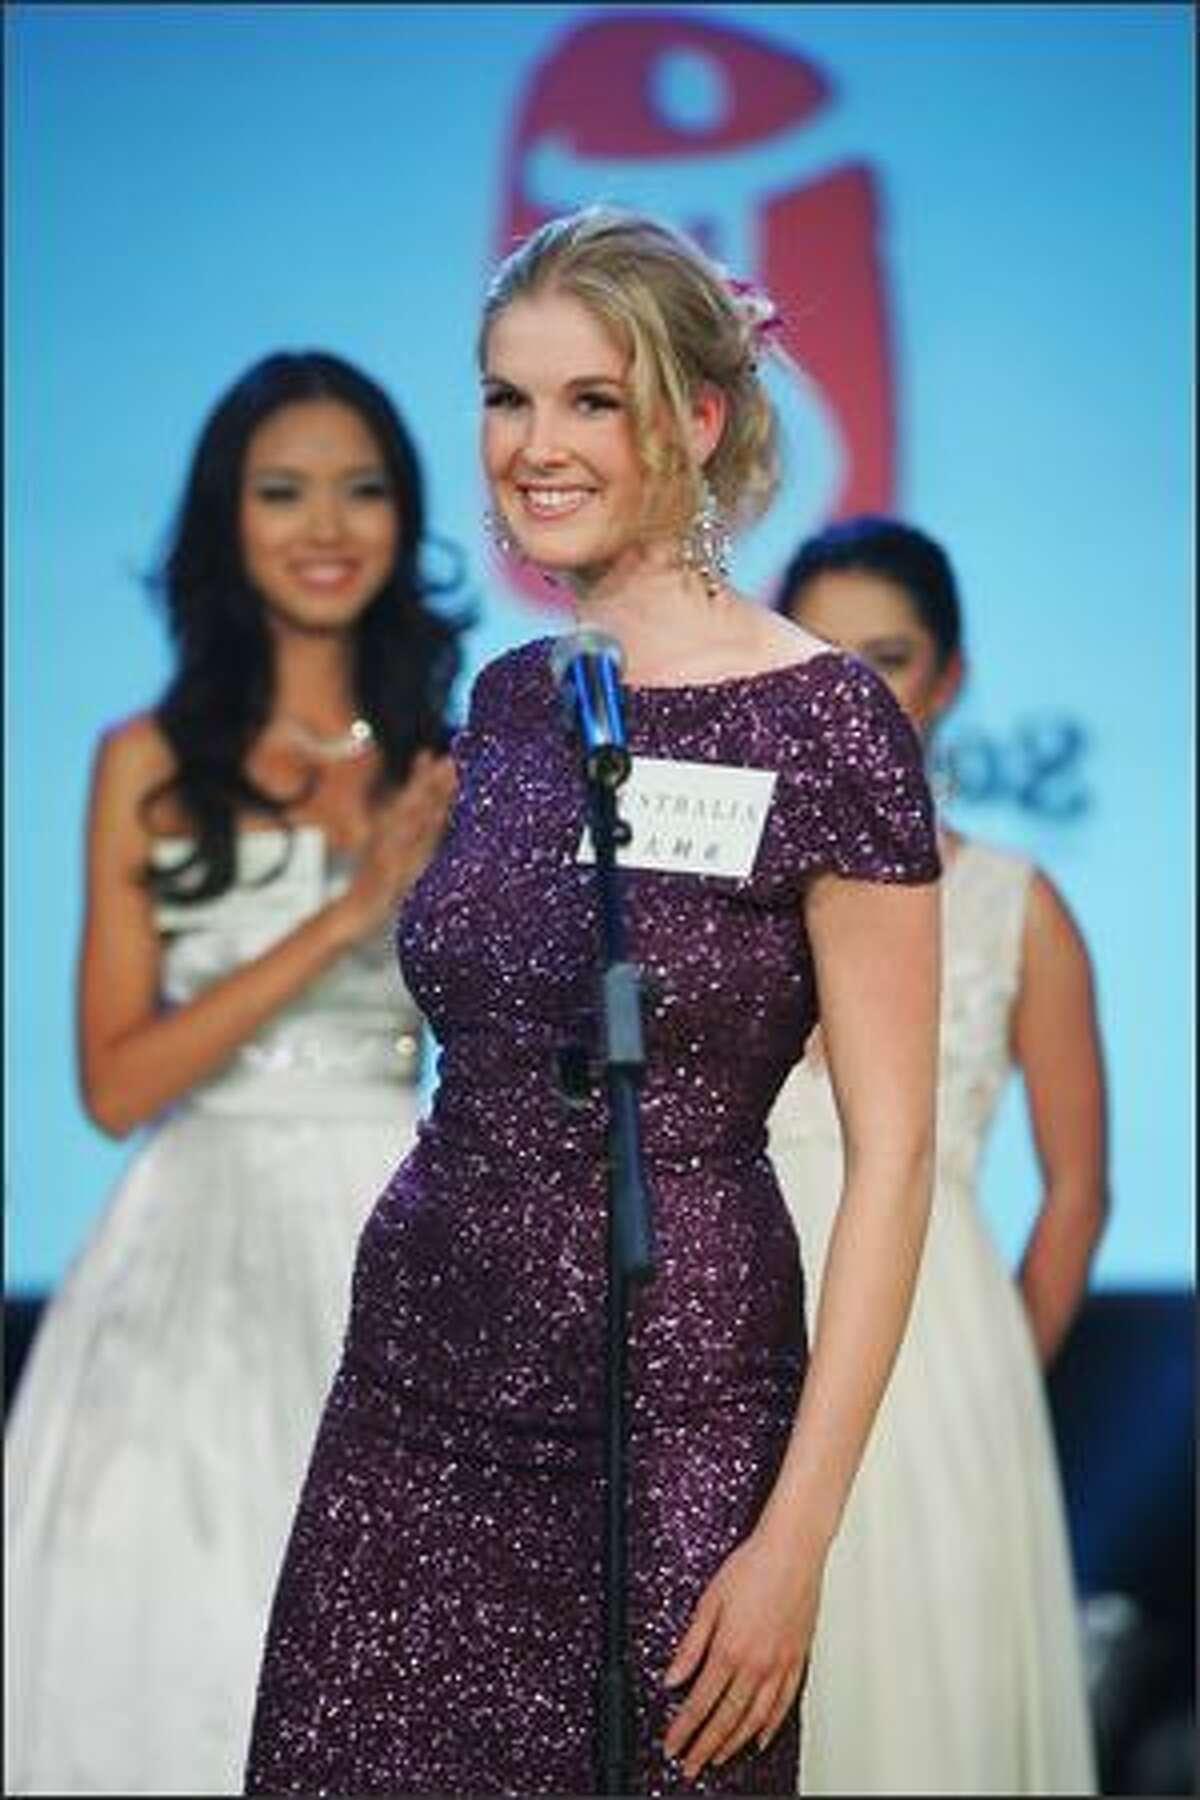 Caroline Pemberton, Miss Australia 2007, introduces herself in a TV studio.